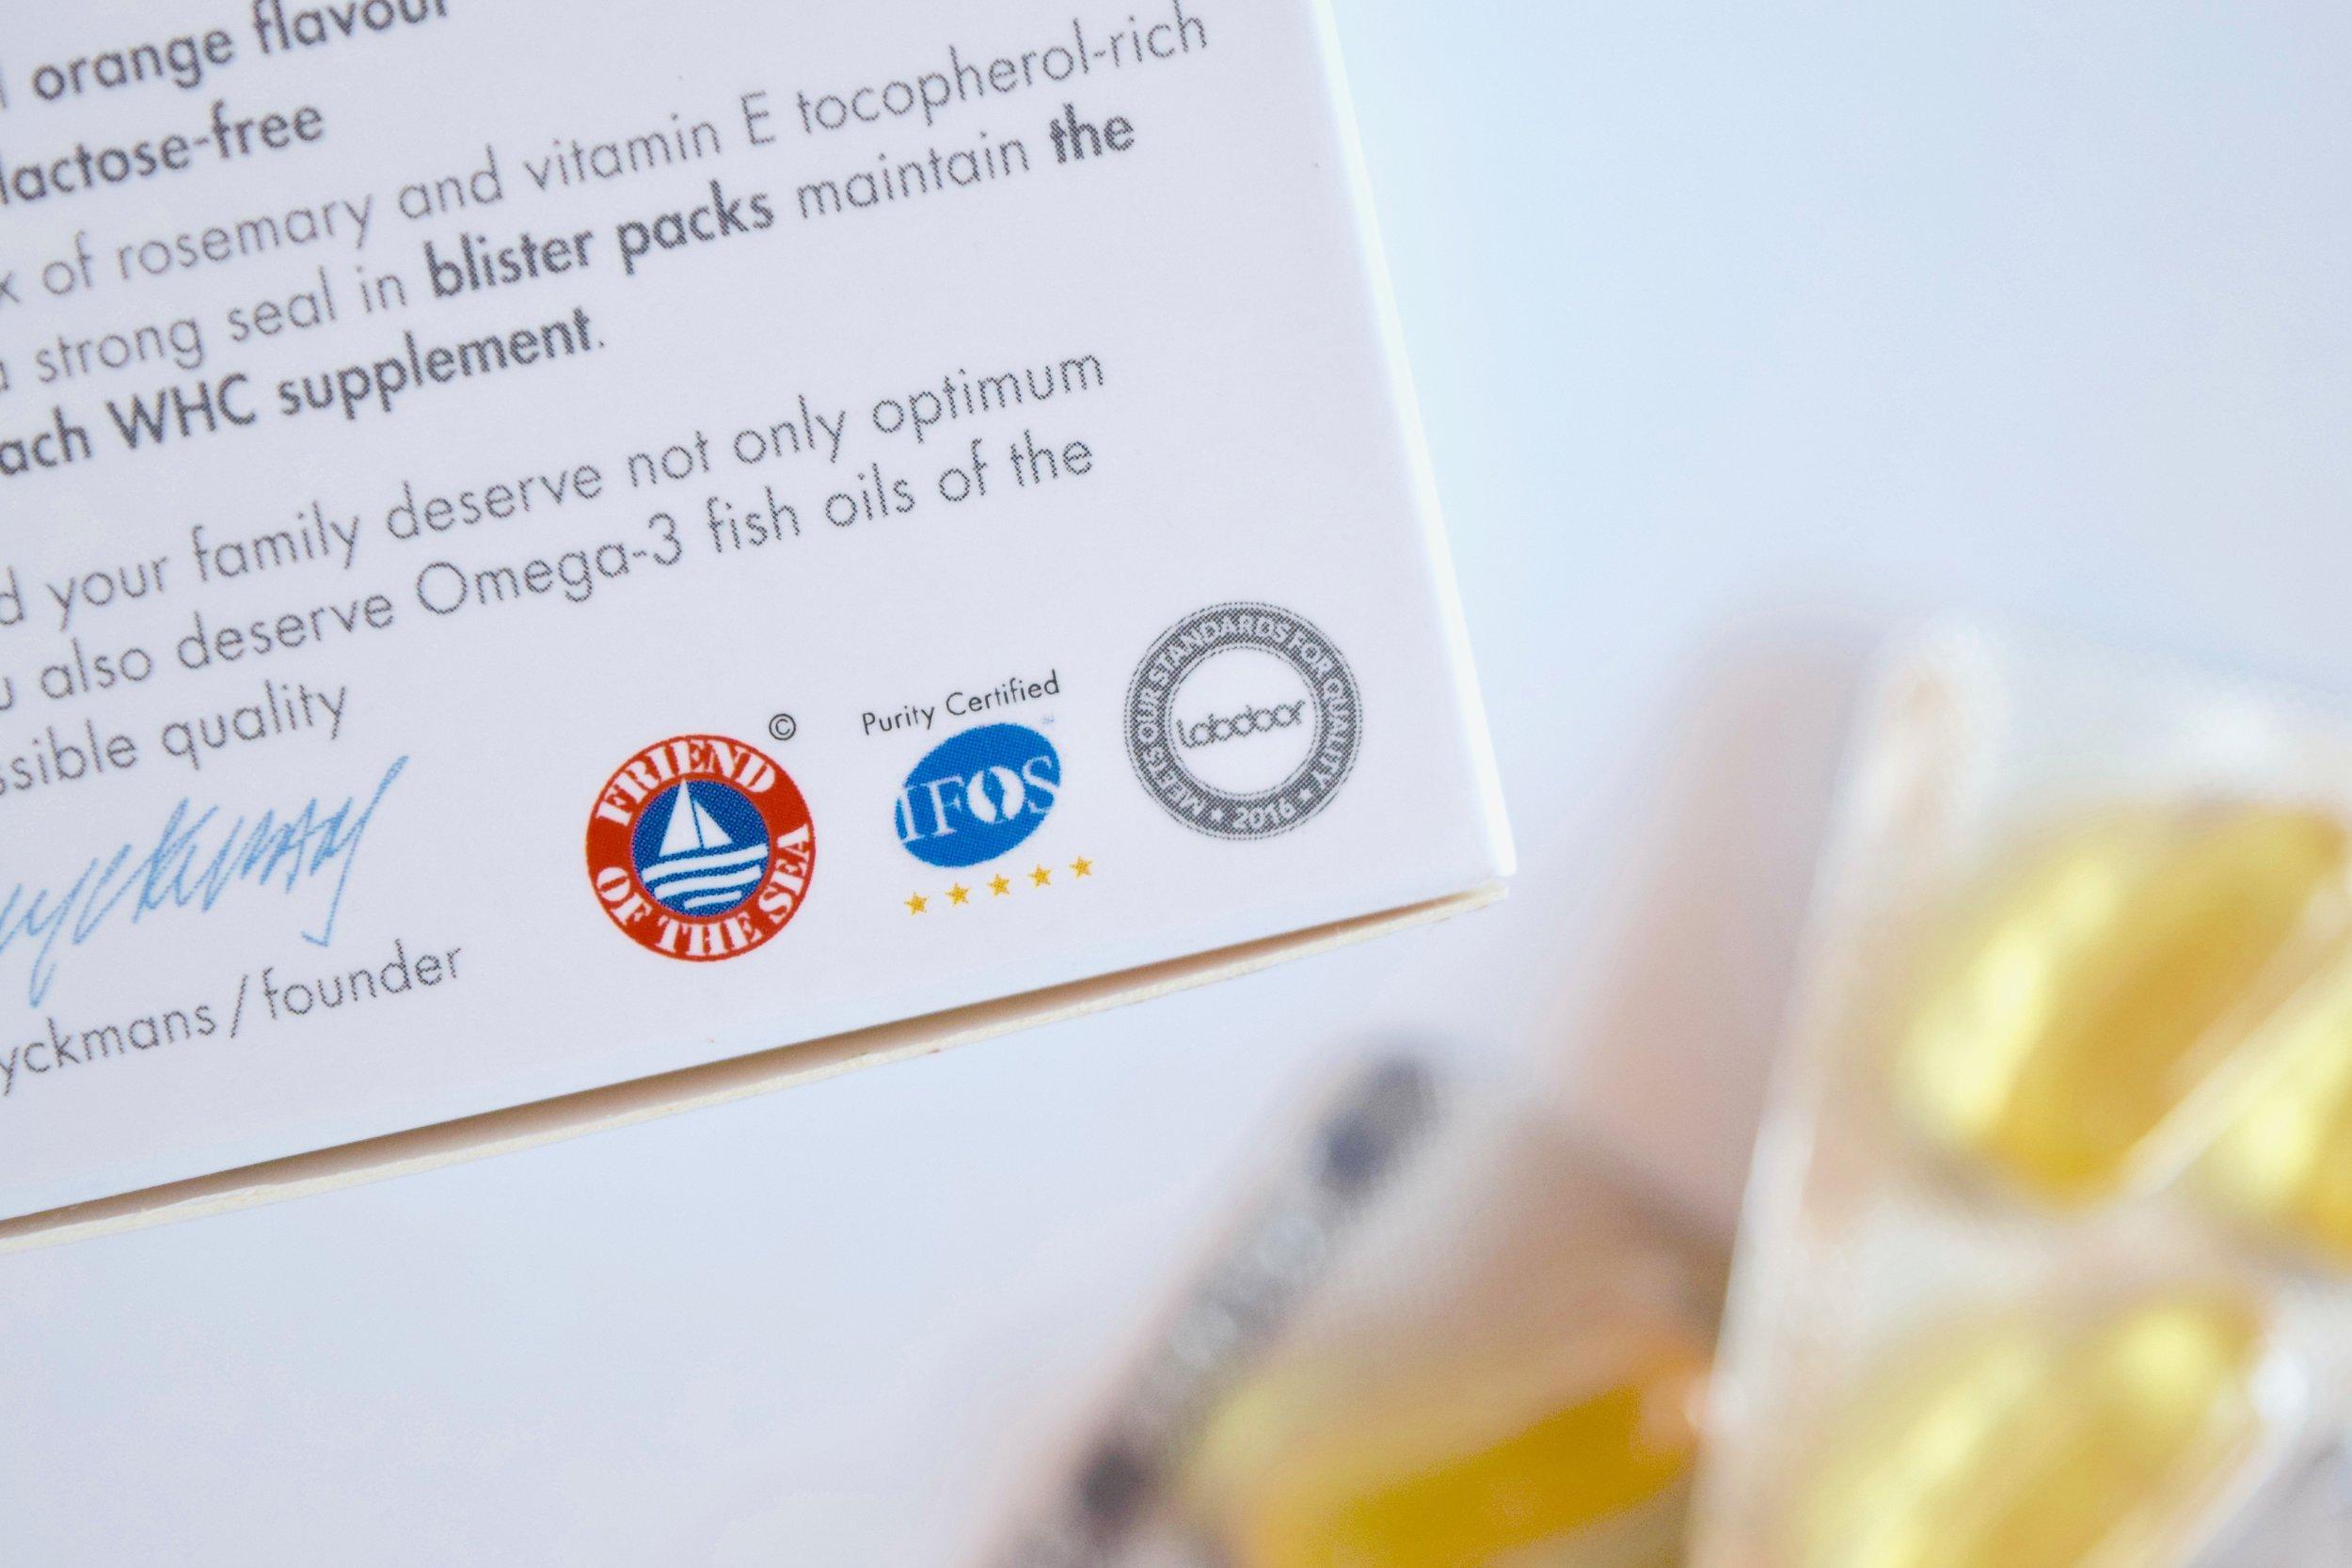 WHC-UnoCardio1000-Vitamind1000-Fish-Oil-Supplement-IFOS-Labdoor